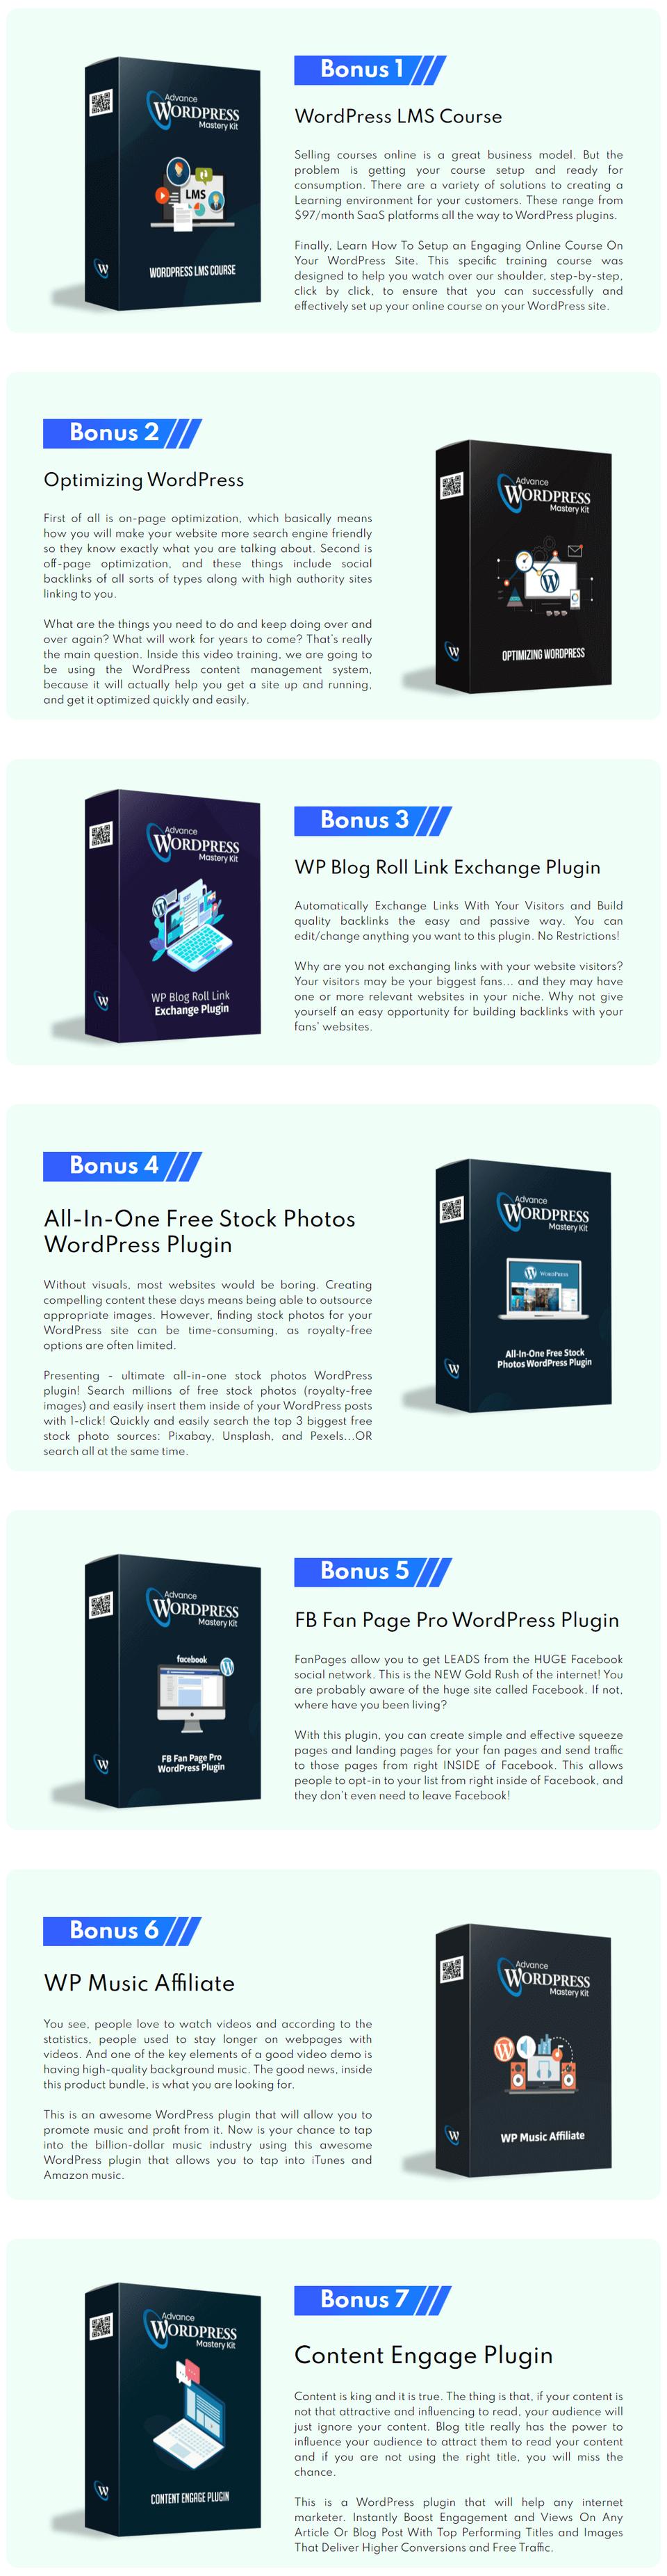 Advance-WordPress-Mastery-Kit-PLR-bonus